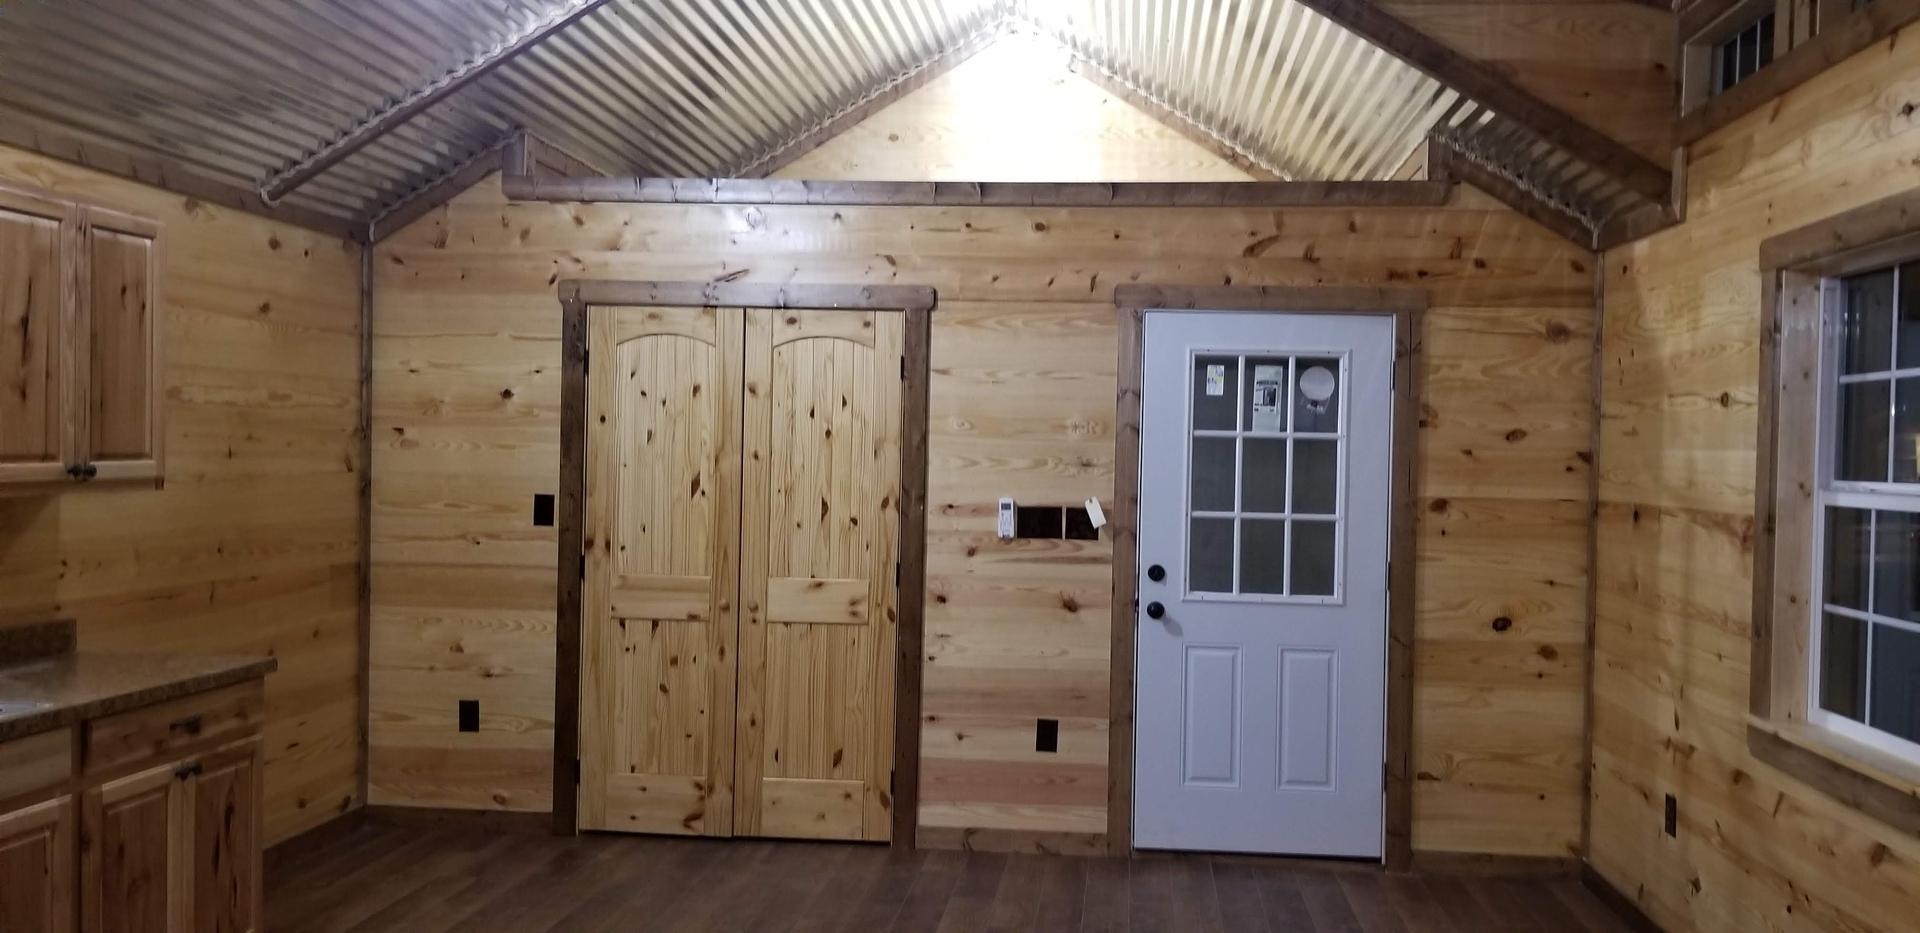 Storage Sheds Barns Cabin Shells Portable Buildings Tiny Homes